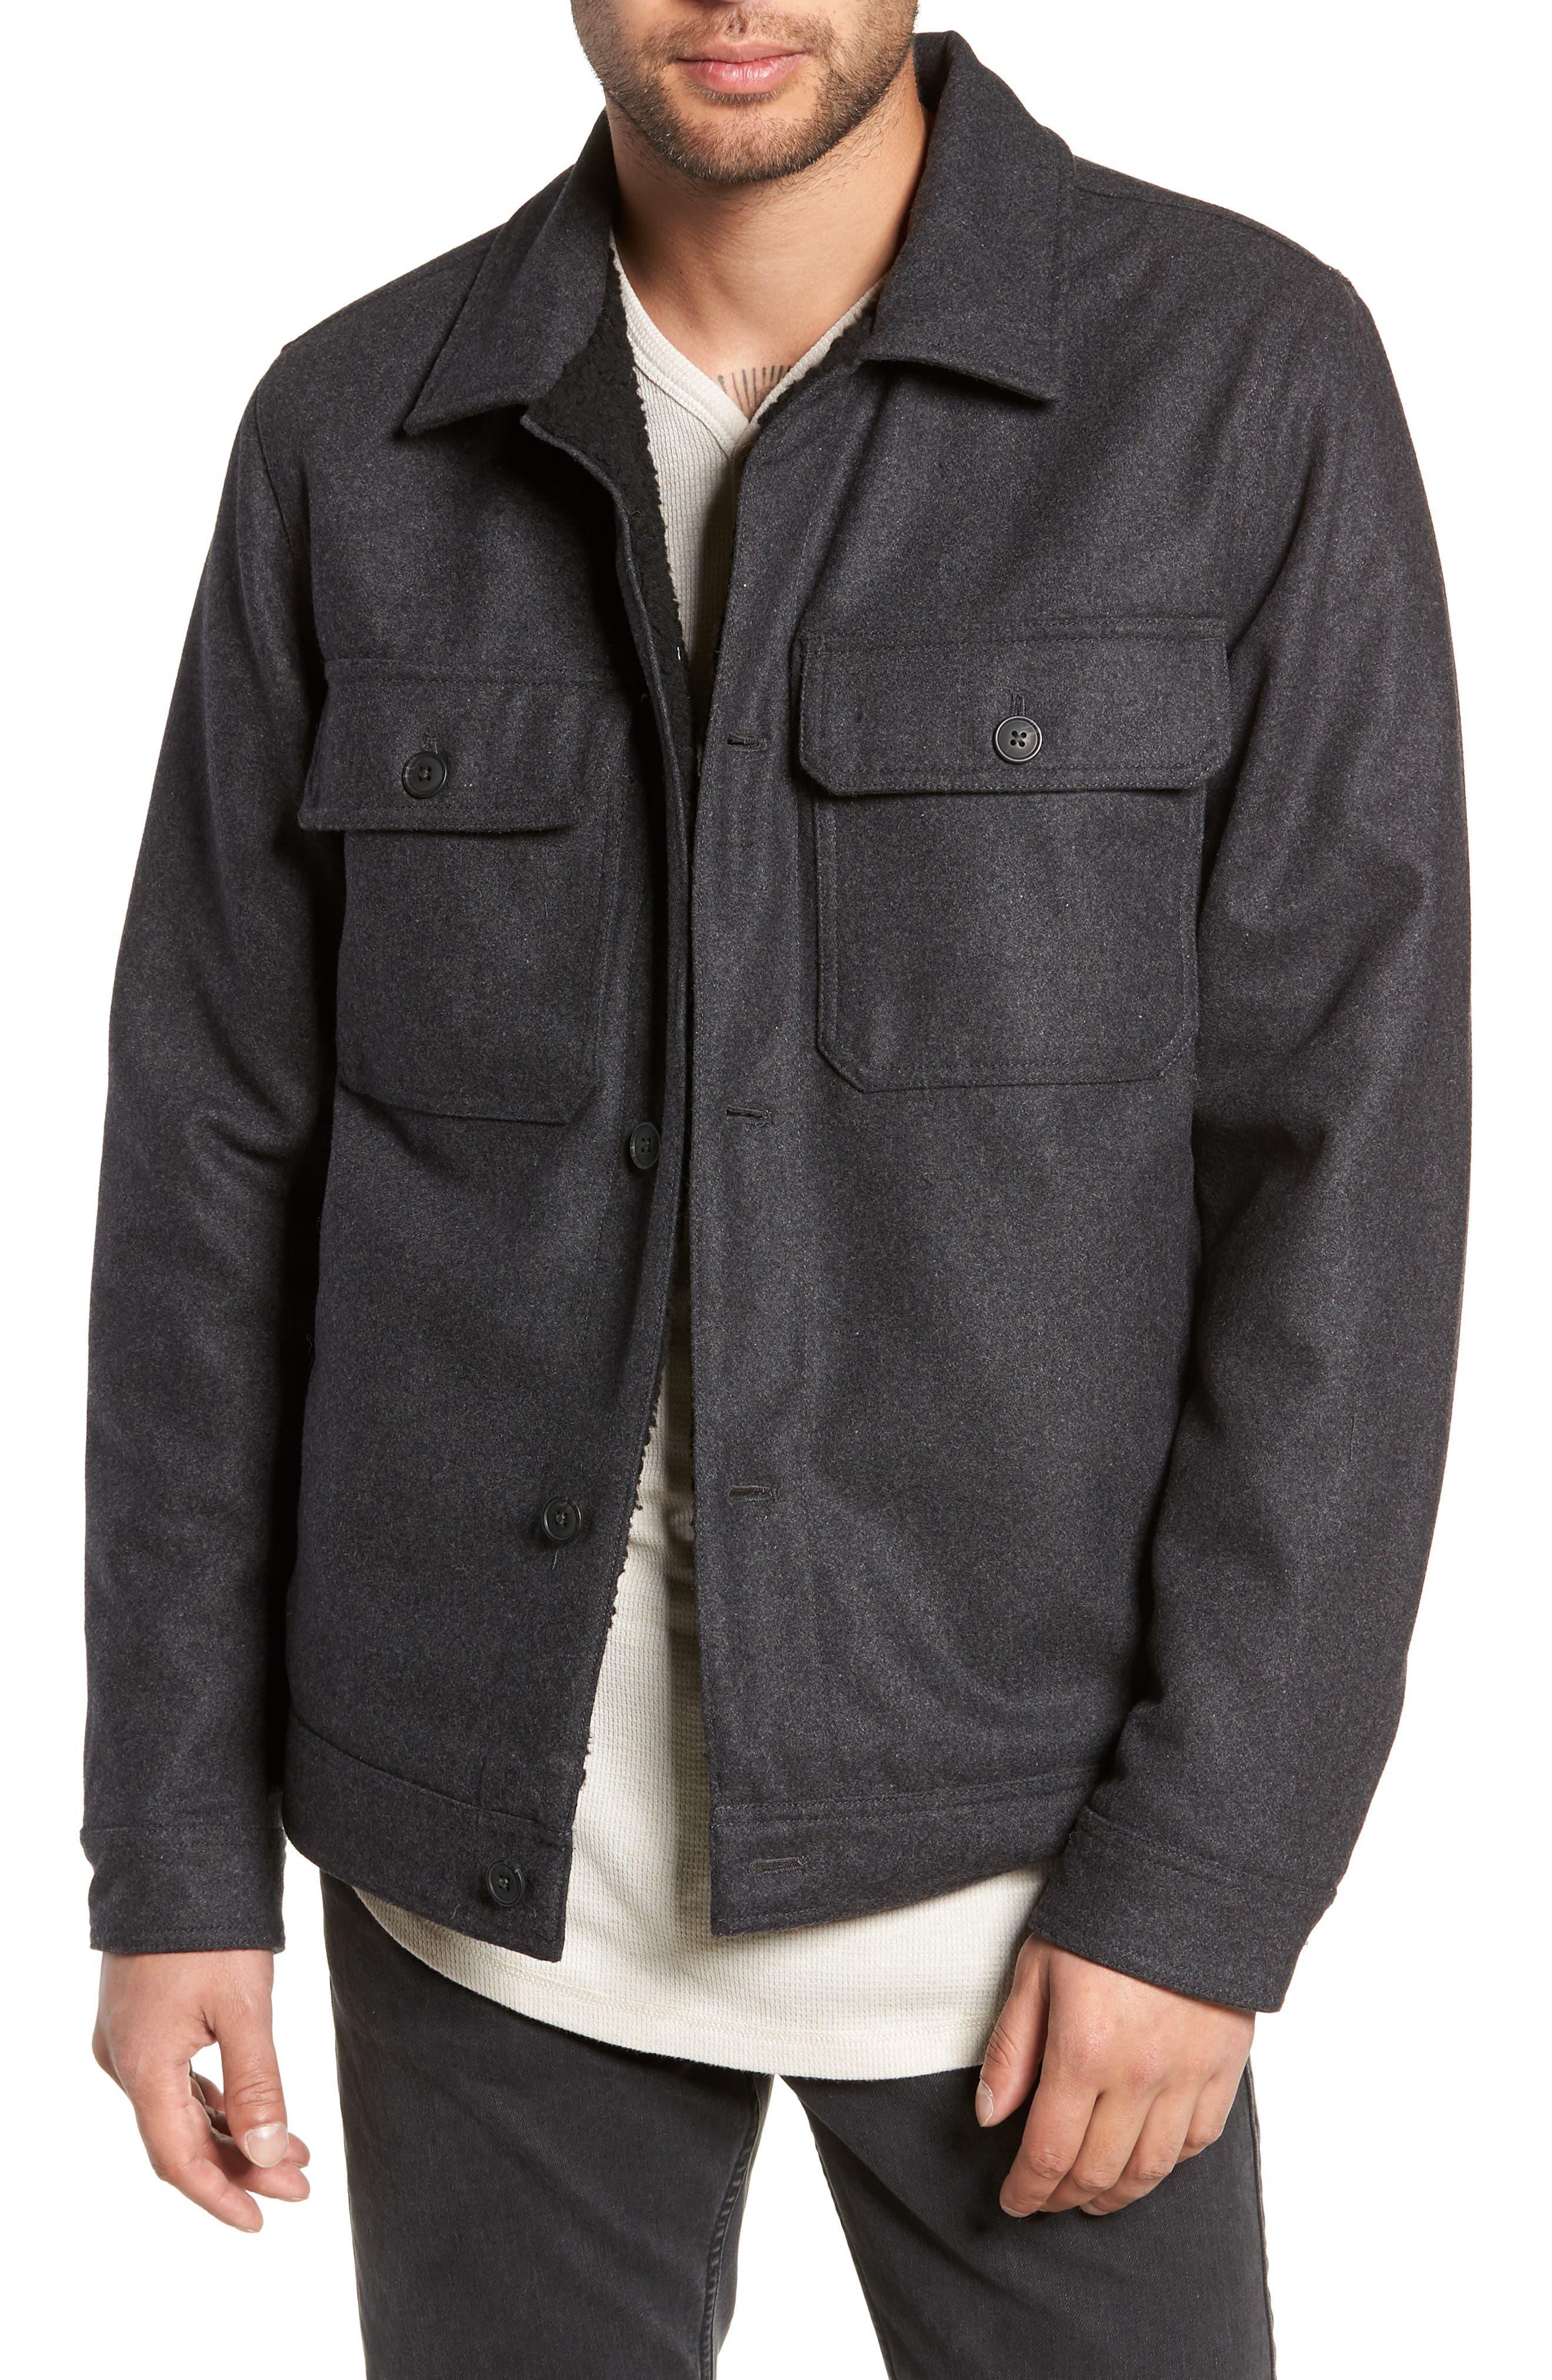 Rossmore Jacket,                             Main thumbnail 1, color,                             ASPHALT